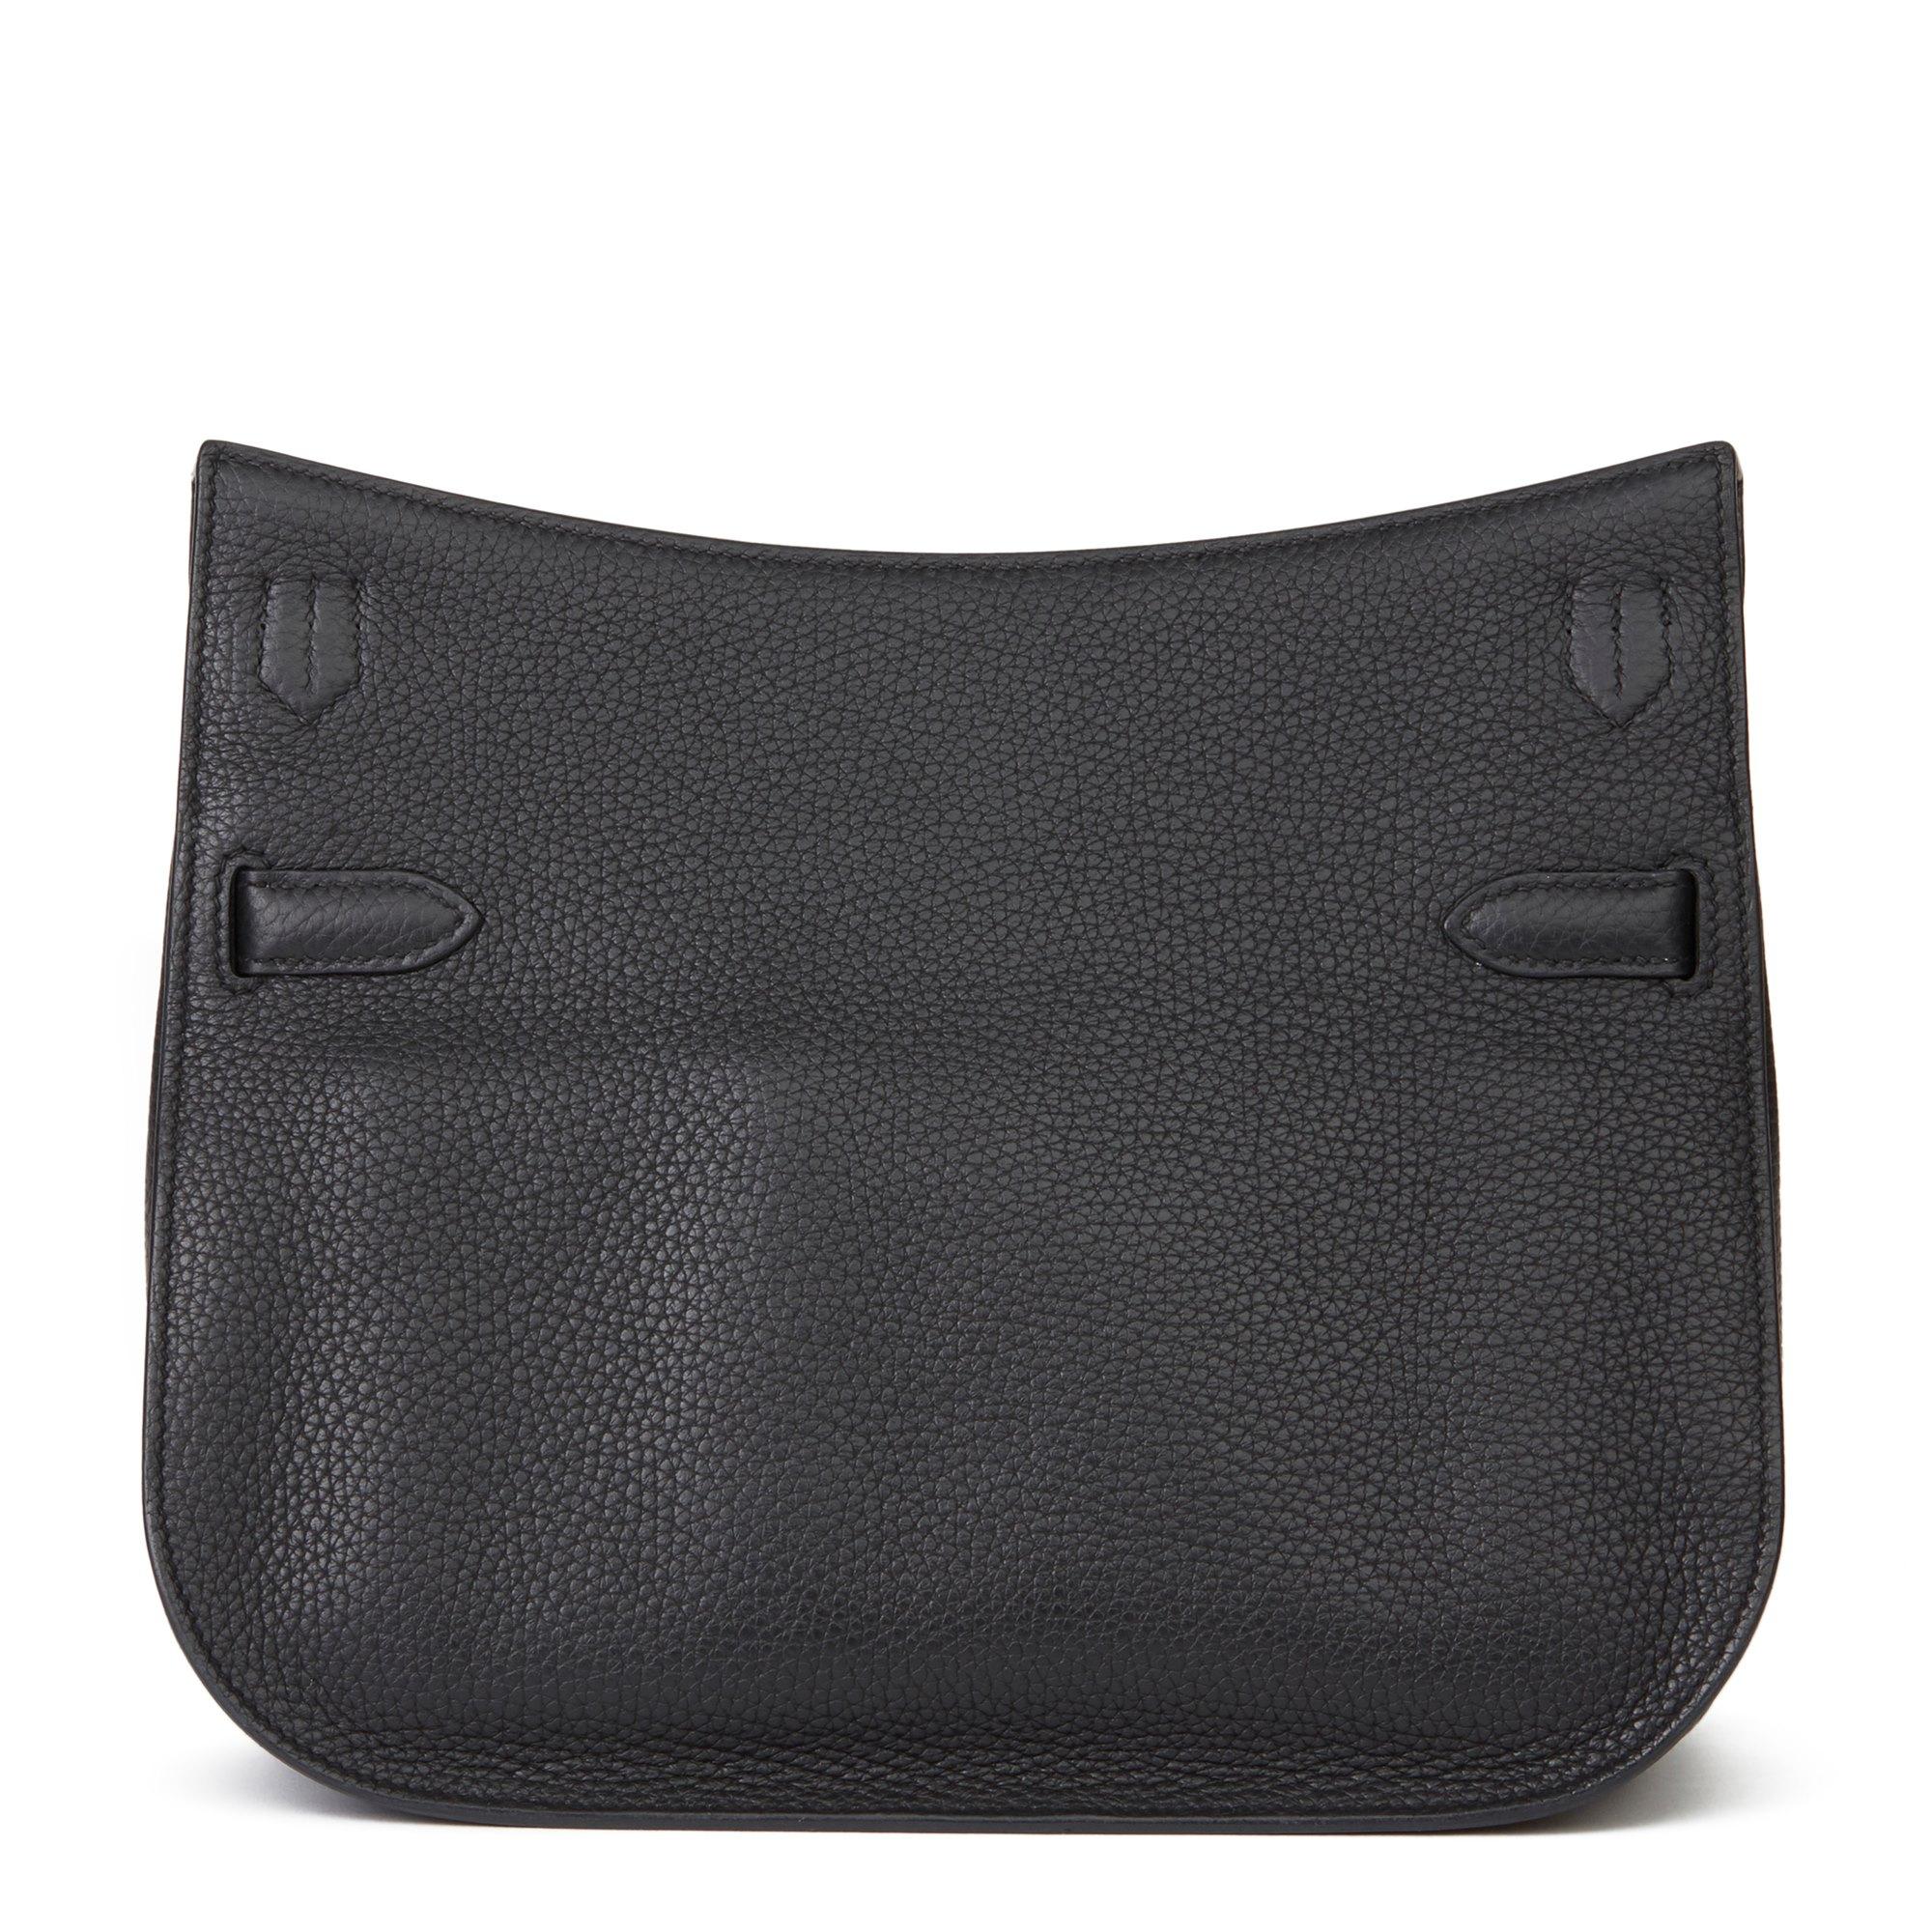 Hermès Black Clemence Leather Jypsiere 29cm